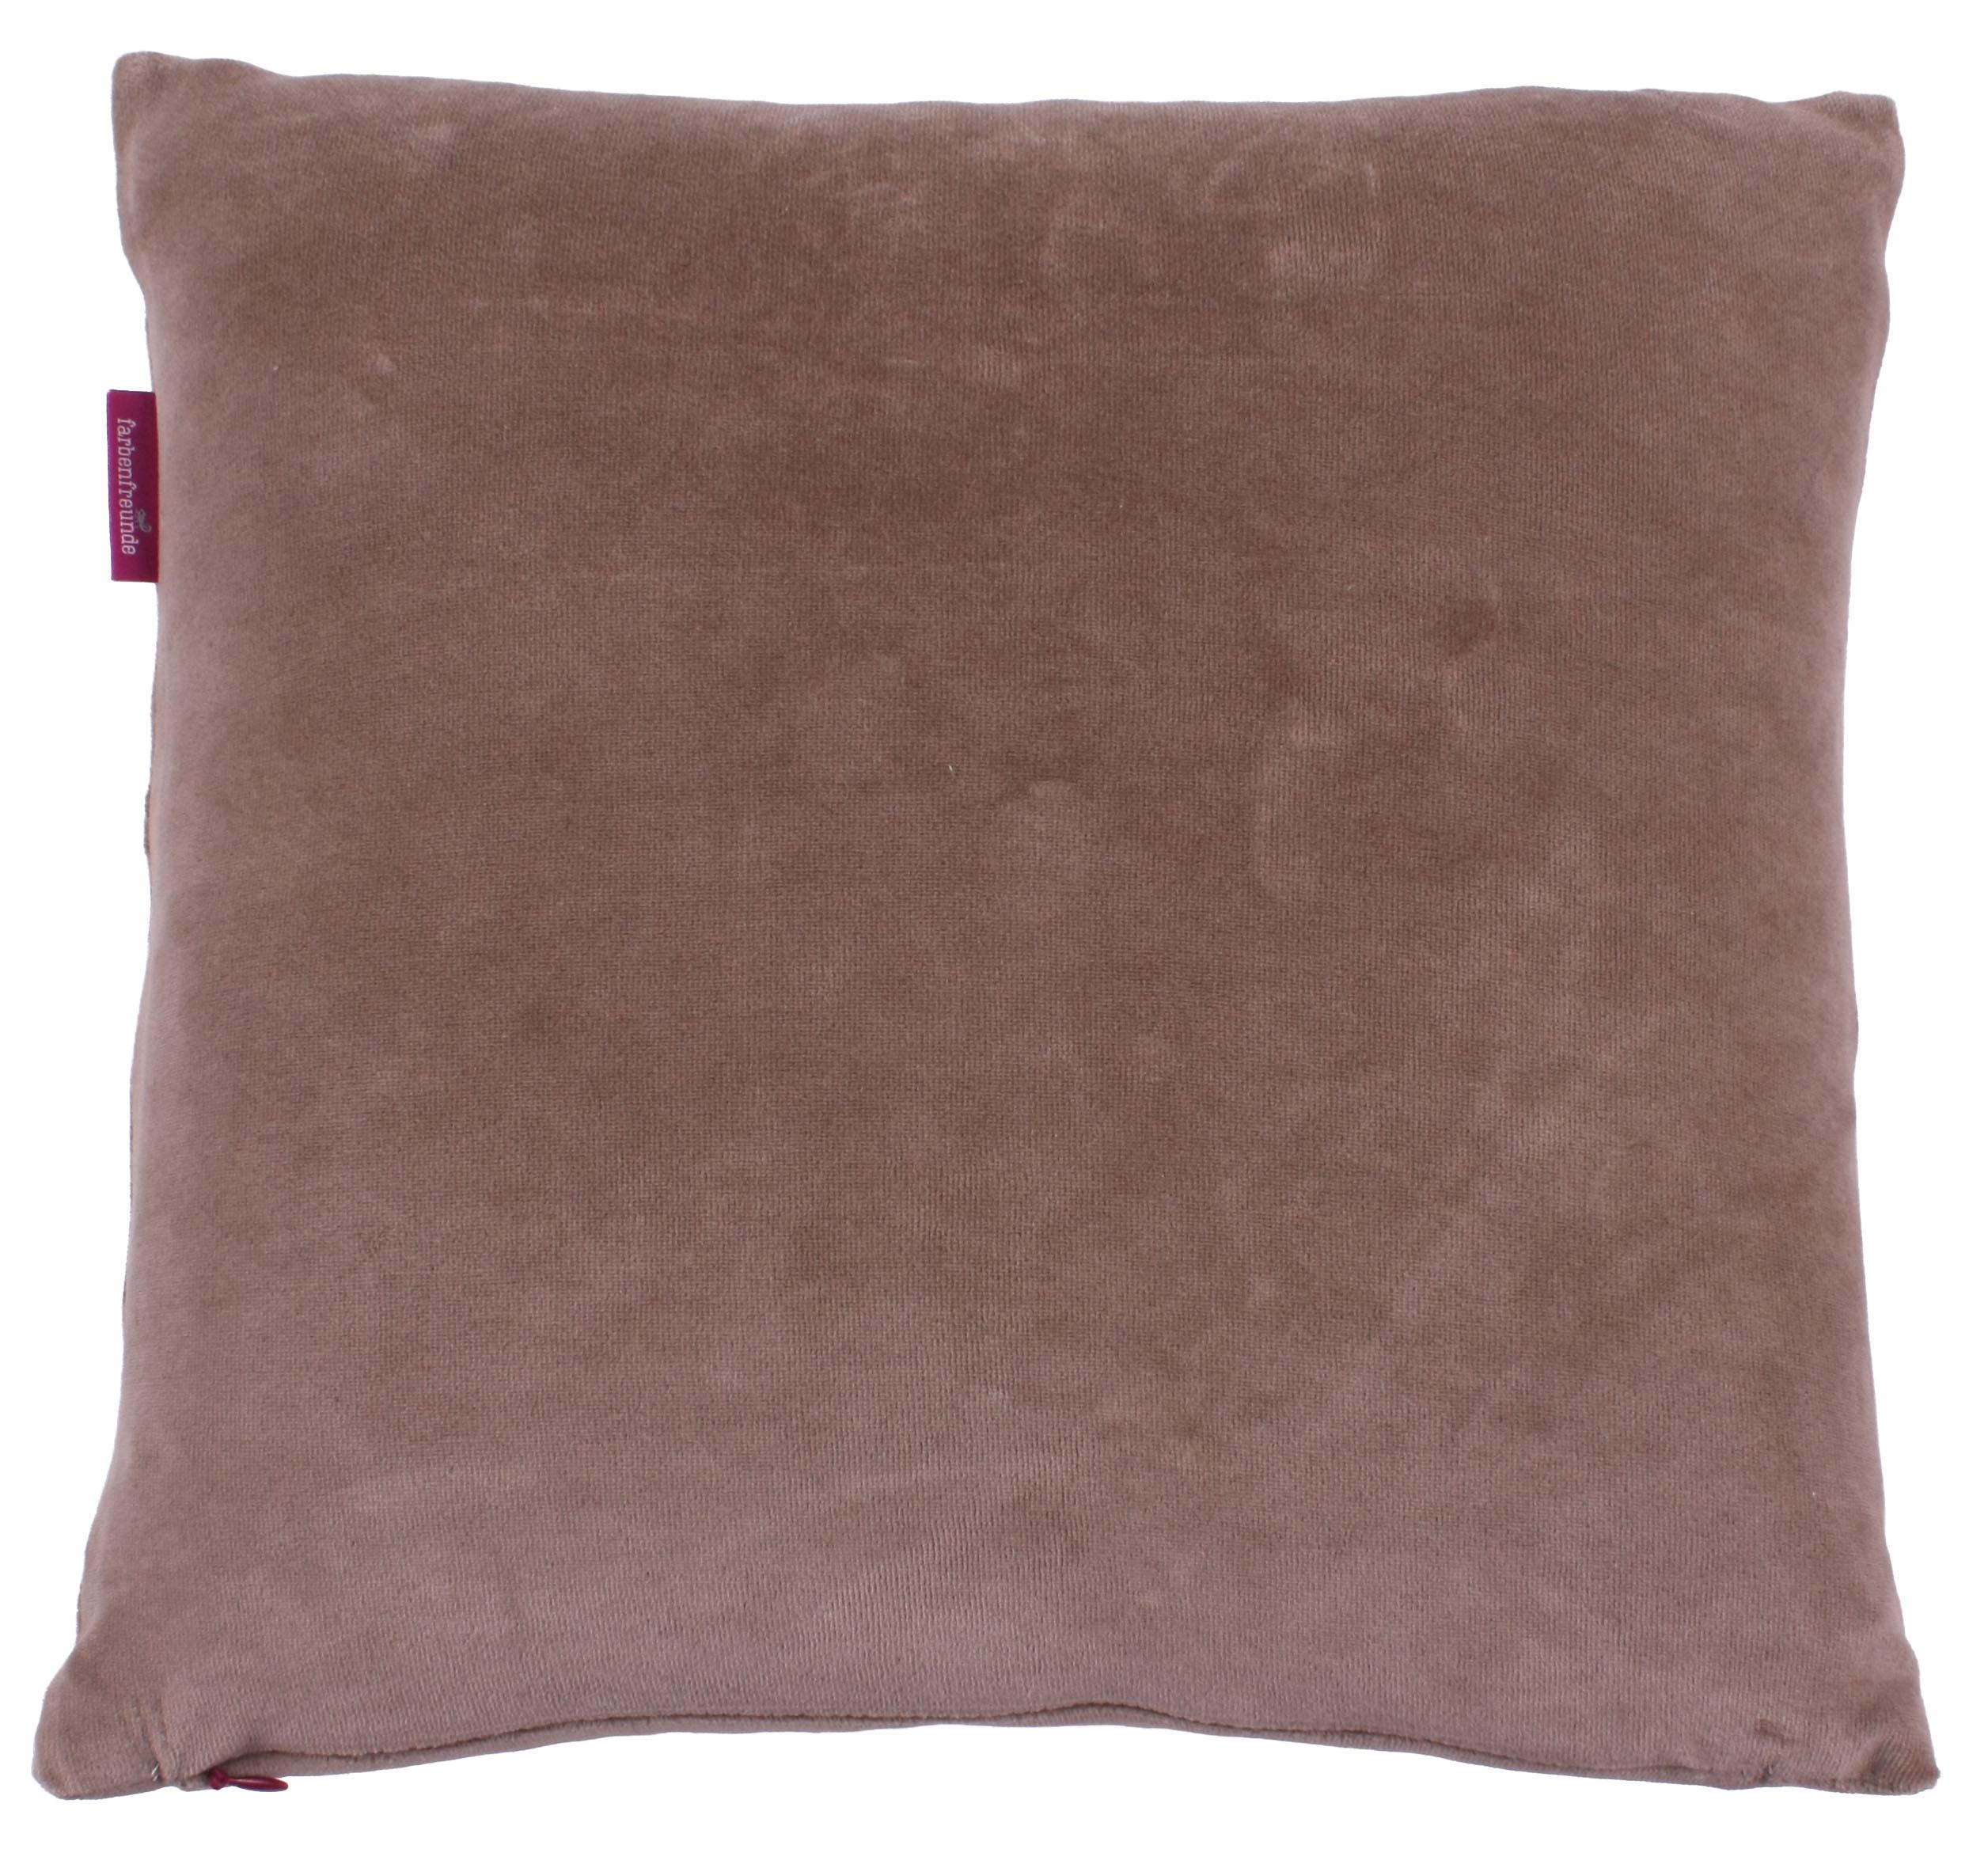 kissenh lle farbenfreunde 40x40 cm muskat der bettenhaus online shop. Black Bedroom Furniture Sets. Home Design Ideas